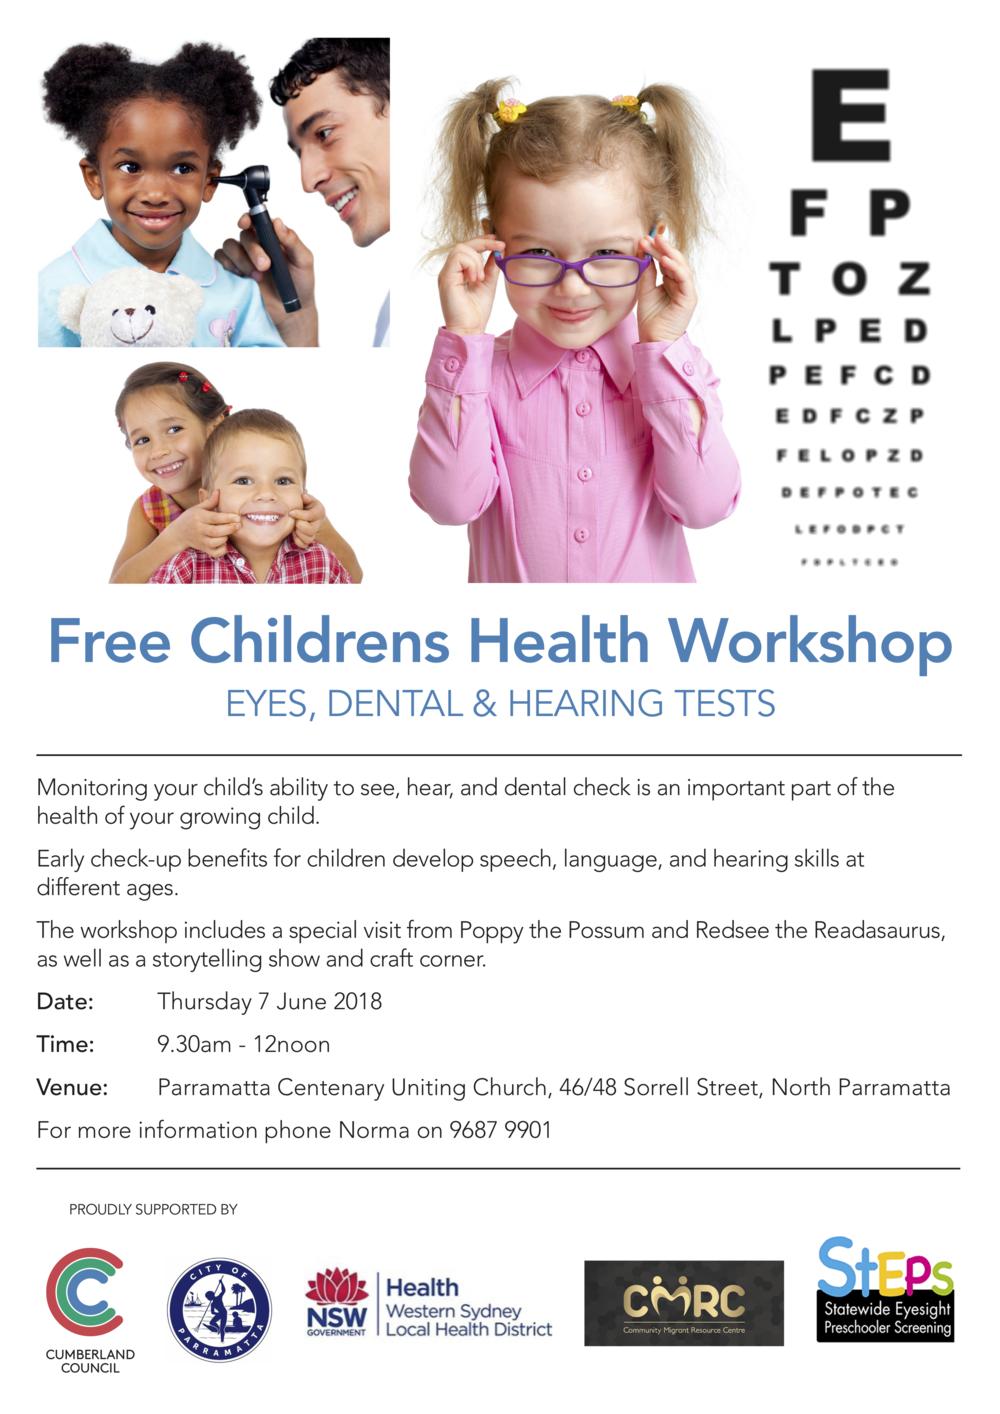 Children's Health Workshop - A4 Flyer - R2 230518.png